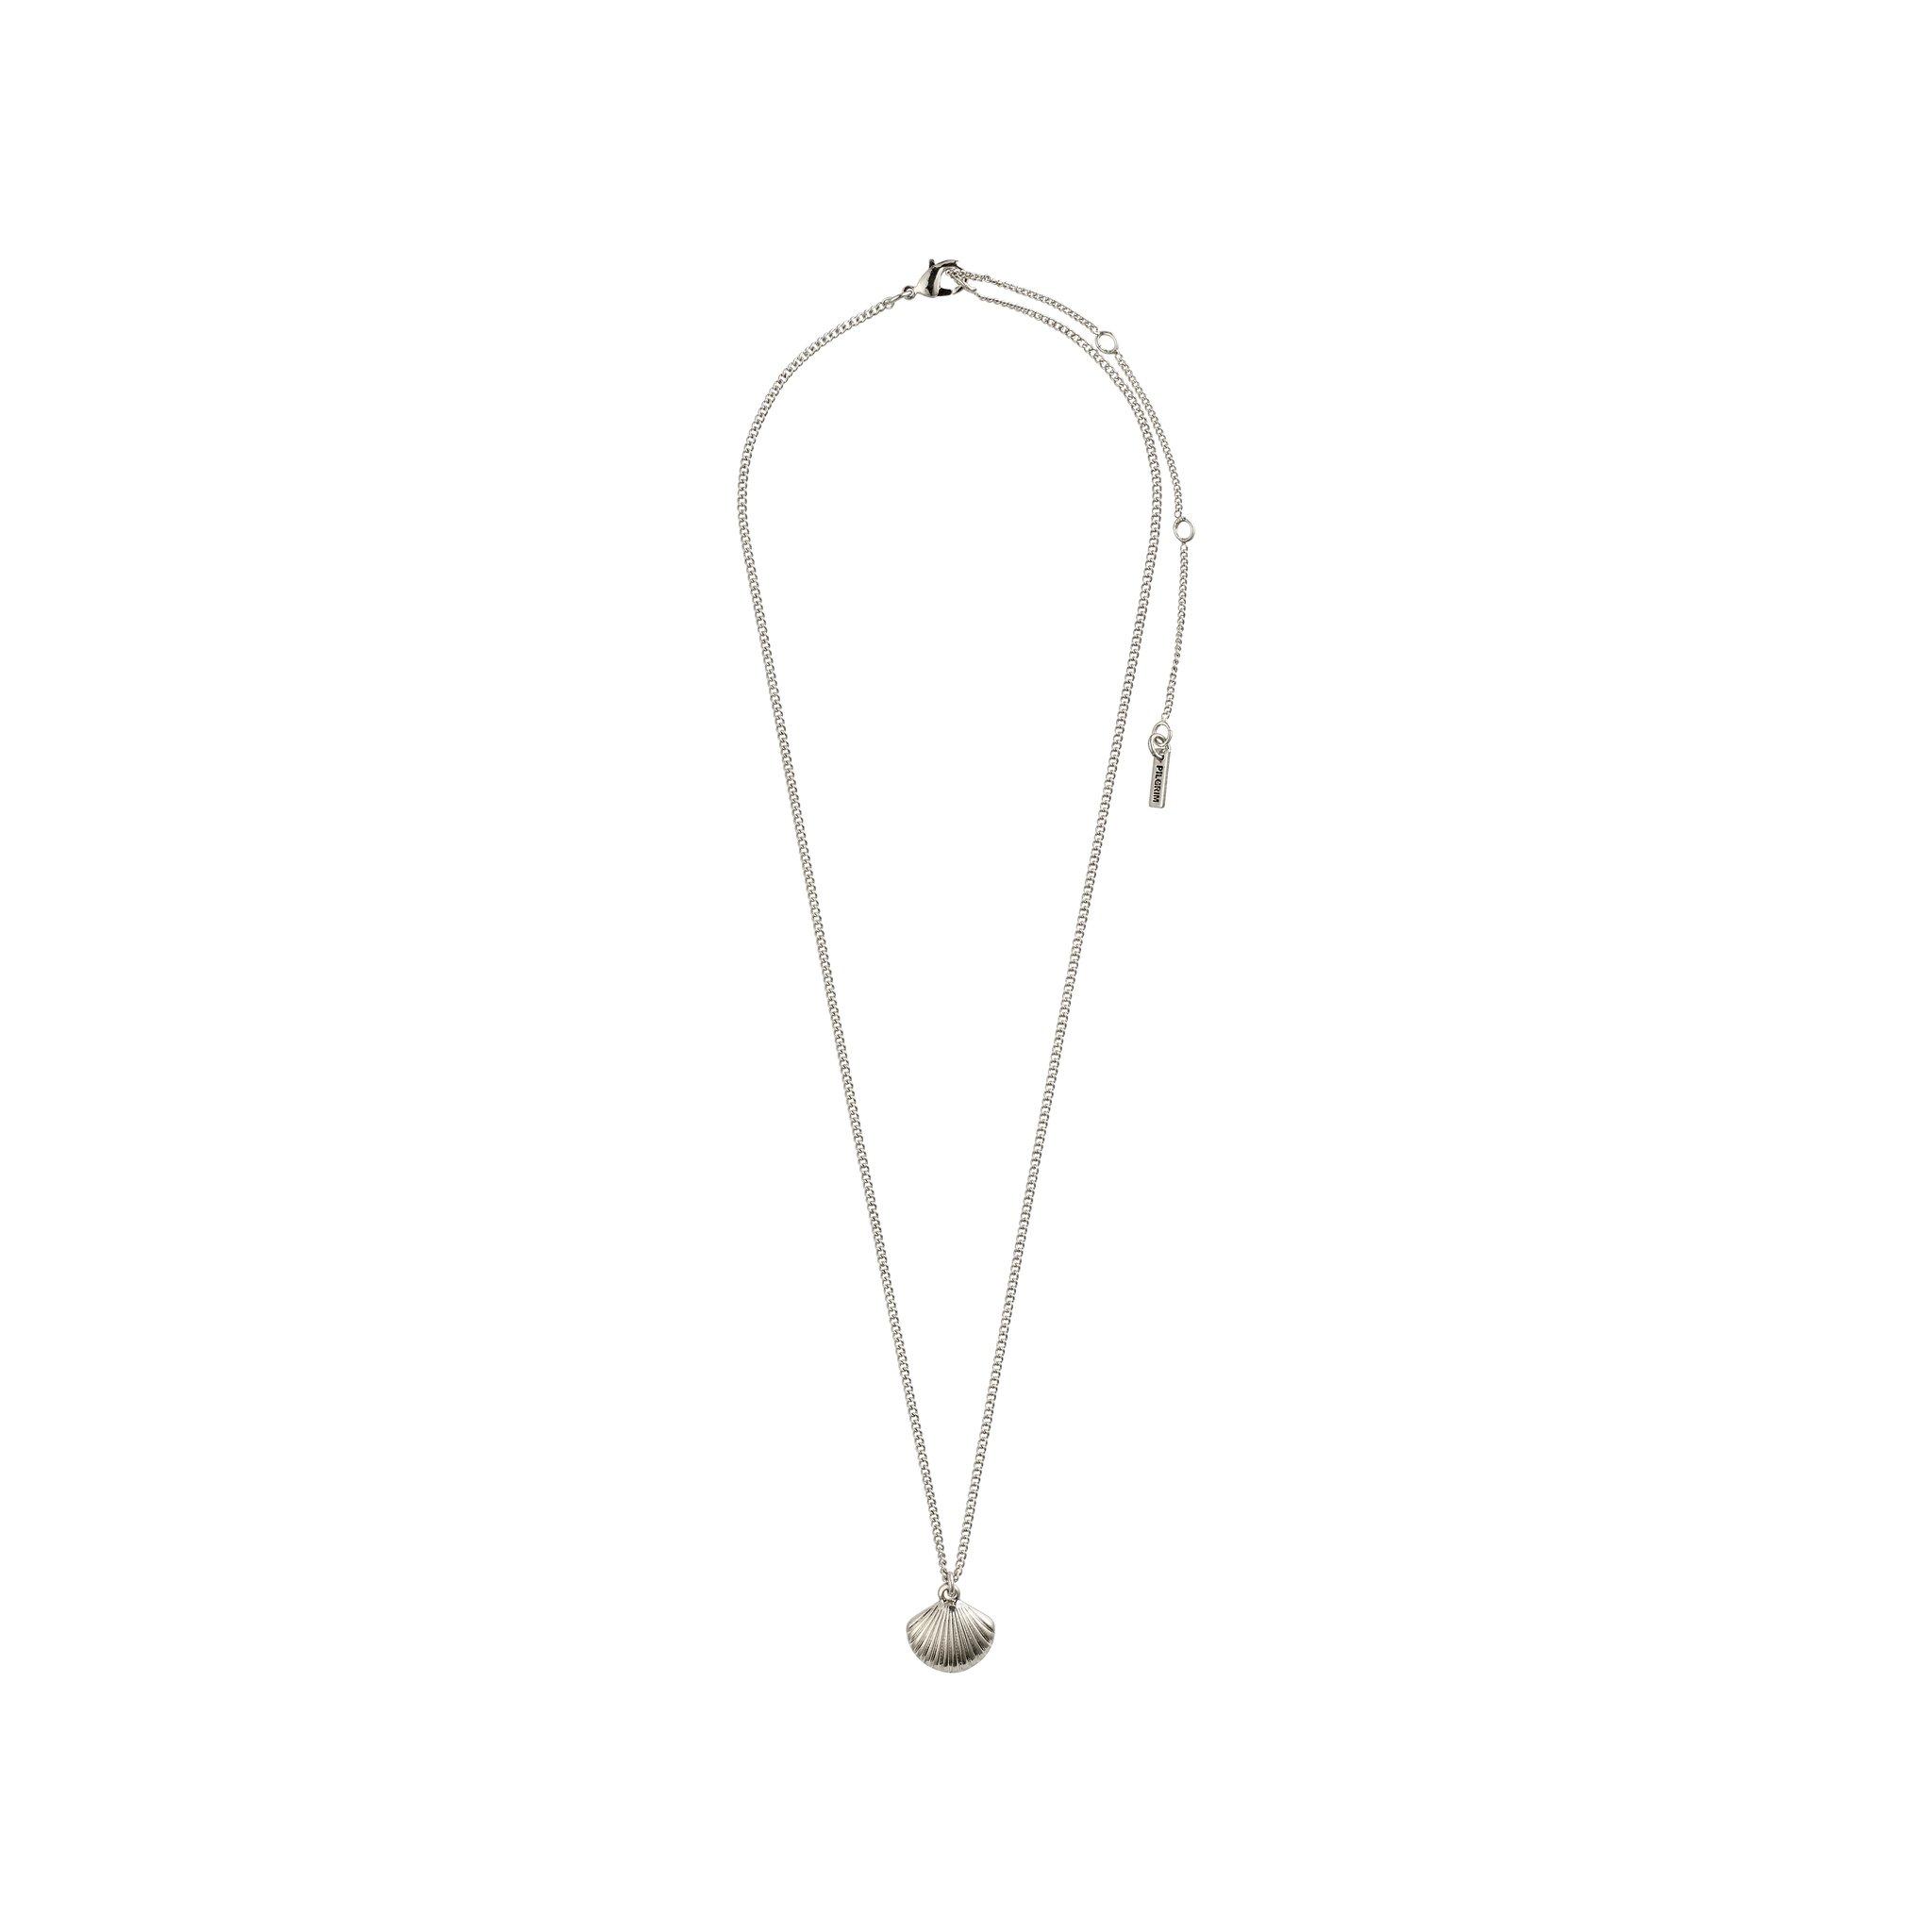 Pilgrim Love halskæde, sølvbelagt